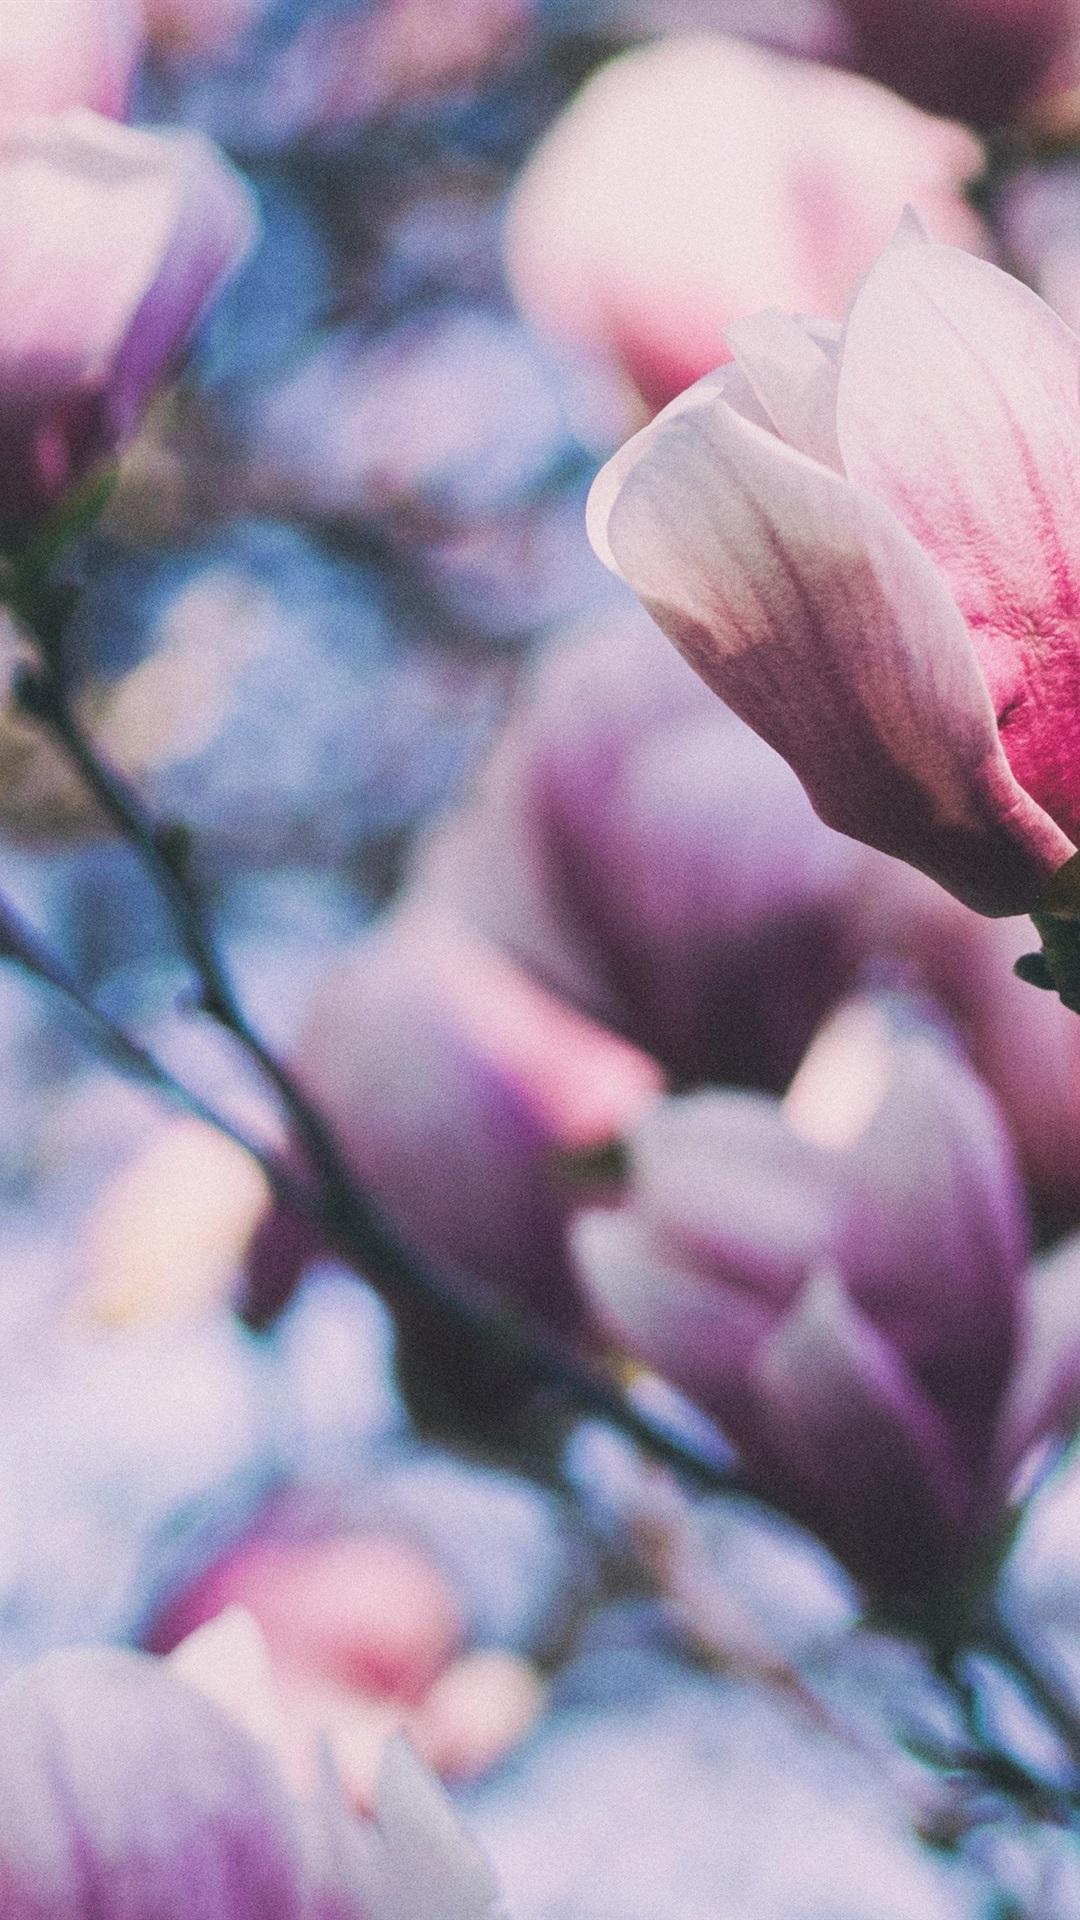 Pink Magnolia Flowers Twigs 1080x1920 Iphone 8766s Plus